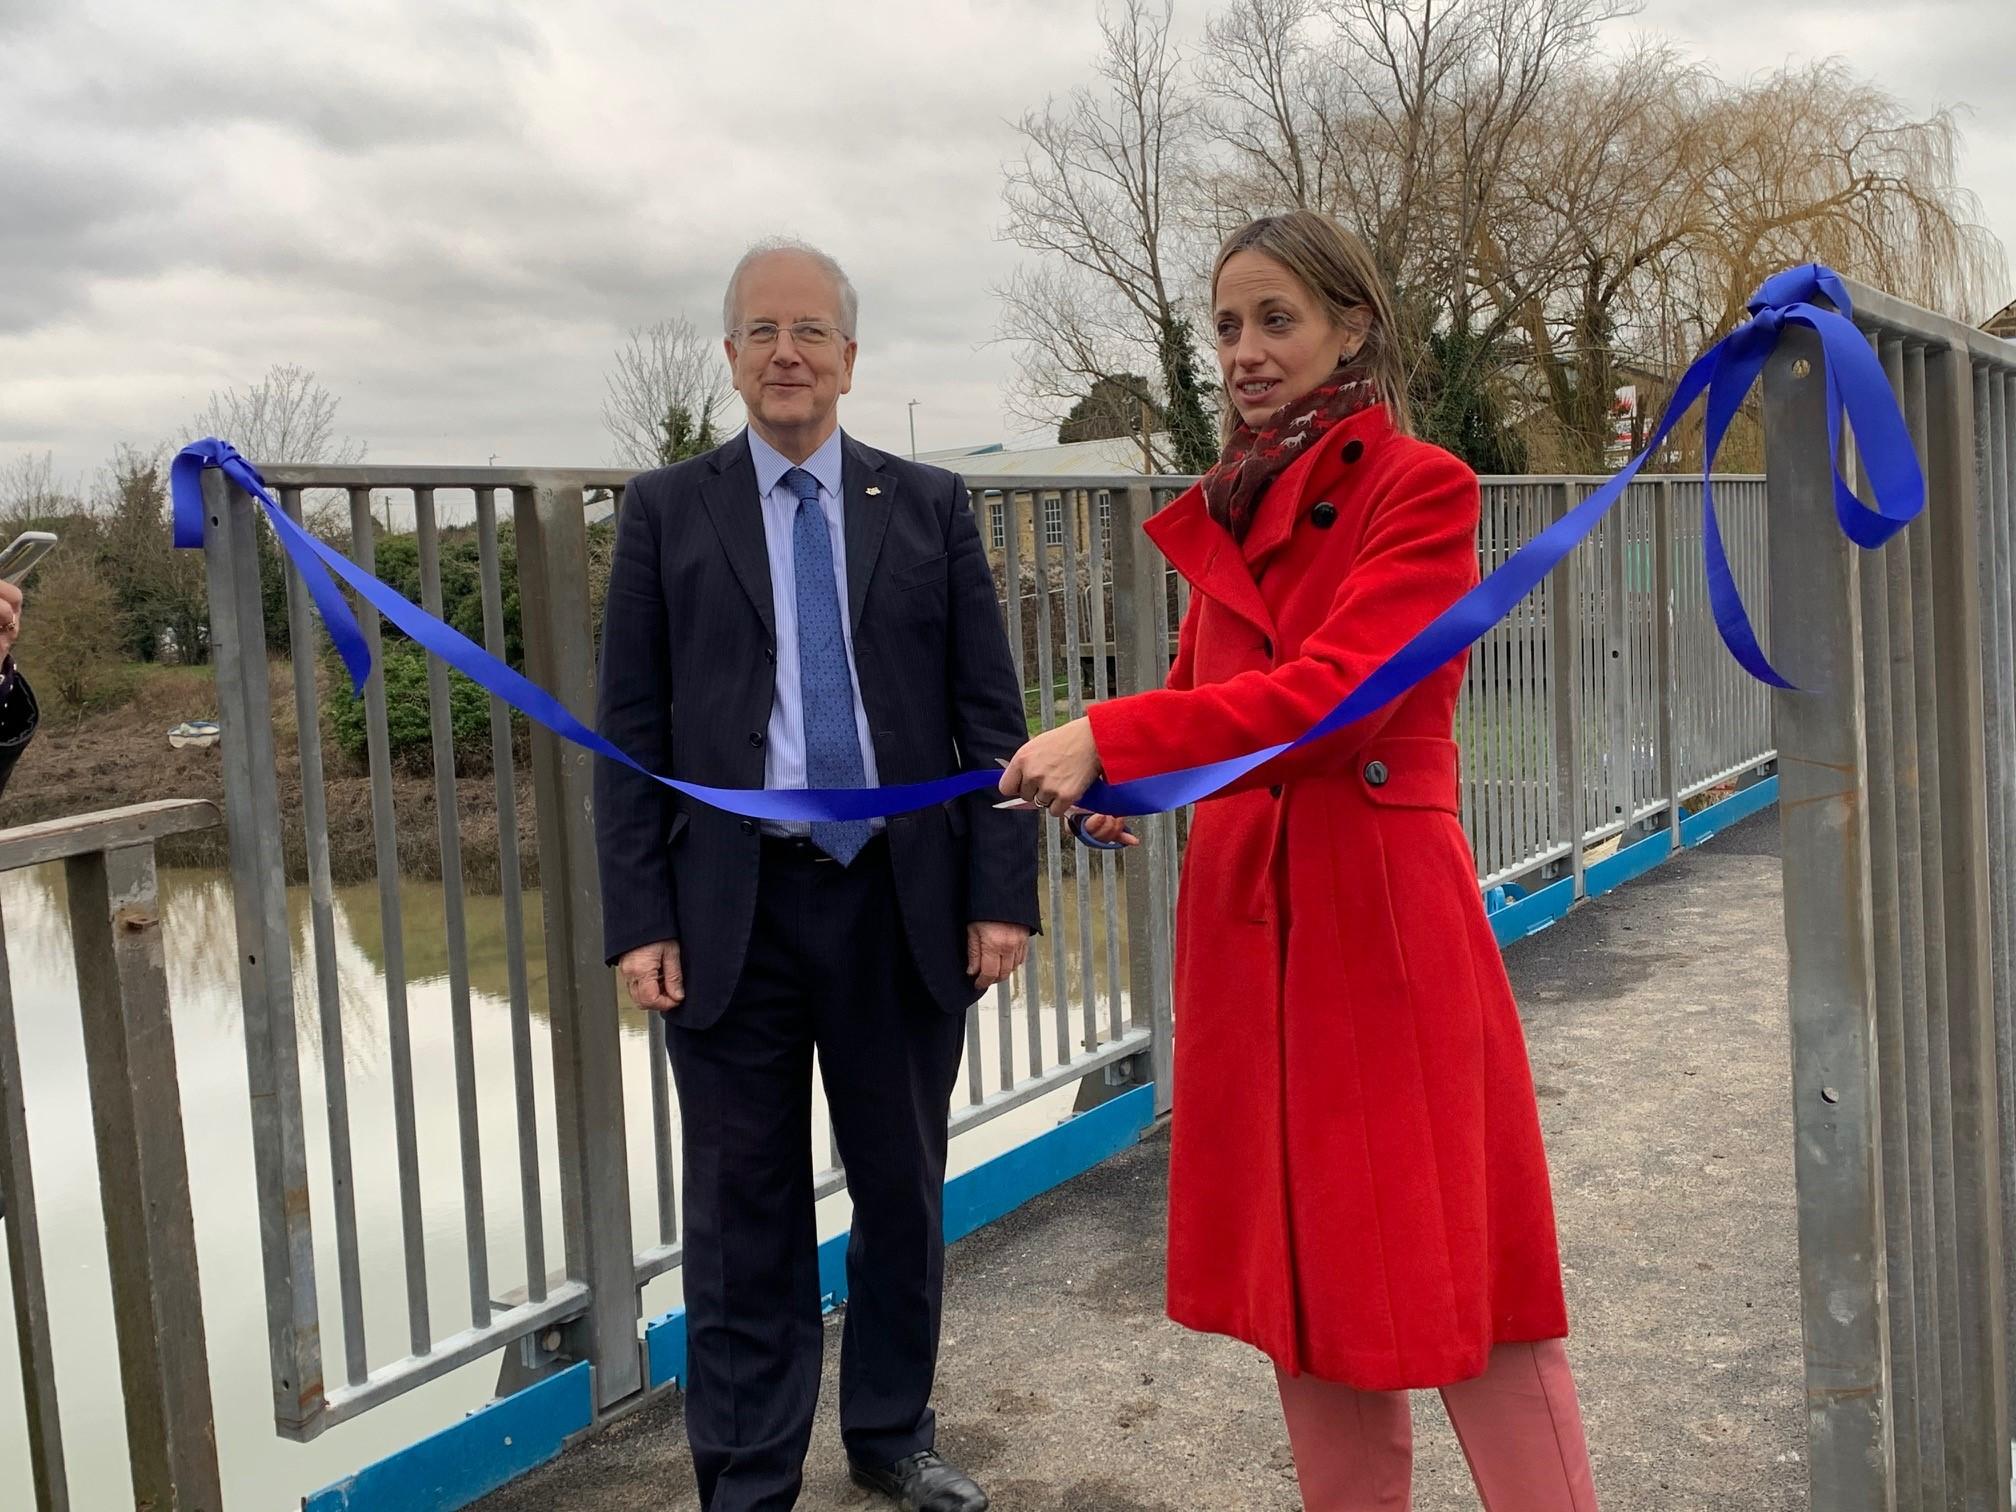 Faversham Creek Bridge Reopened